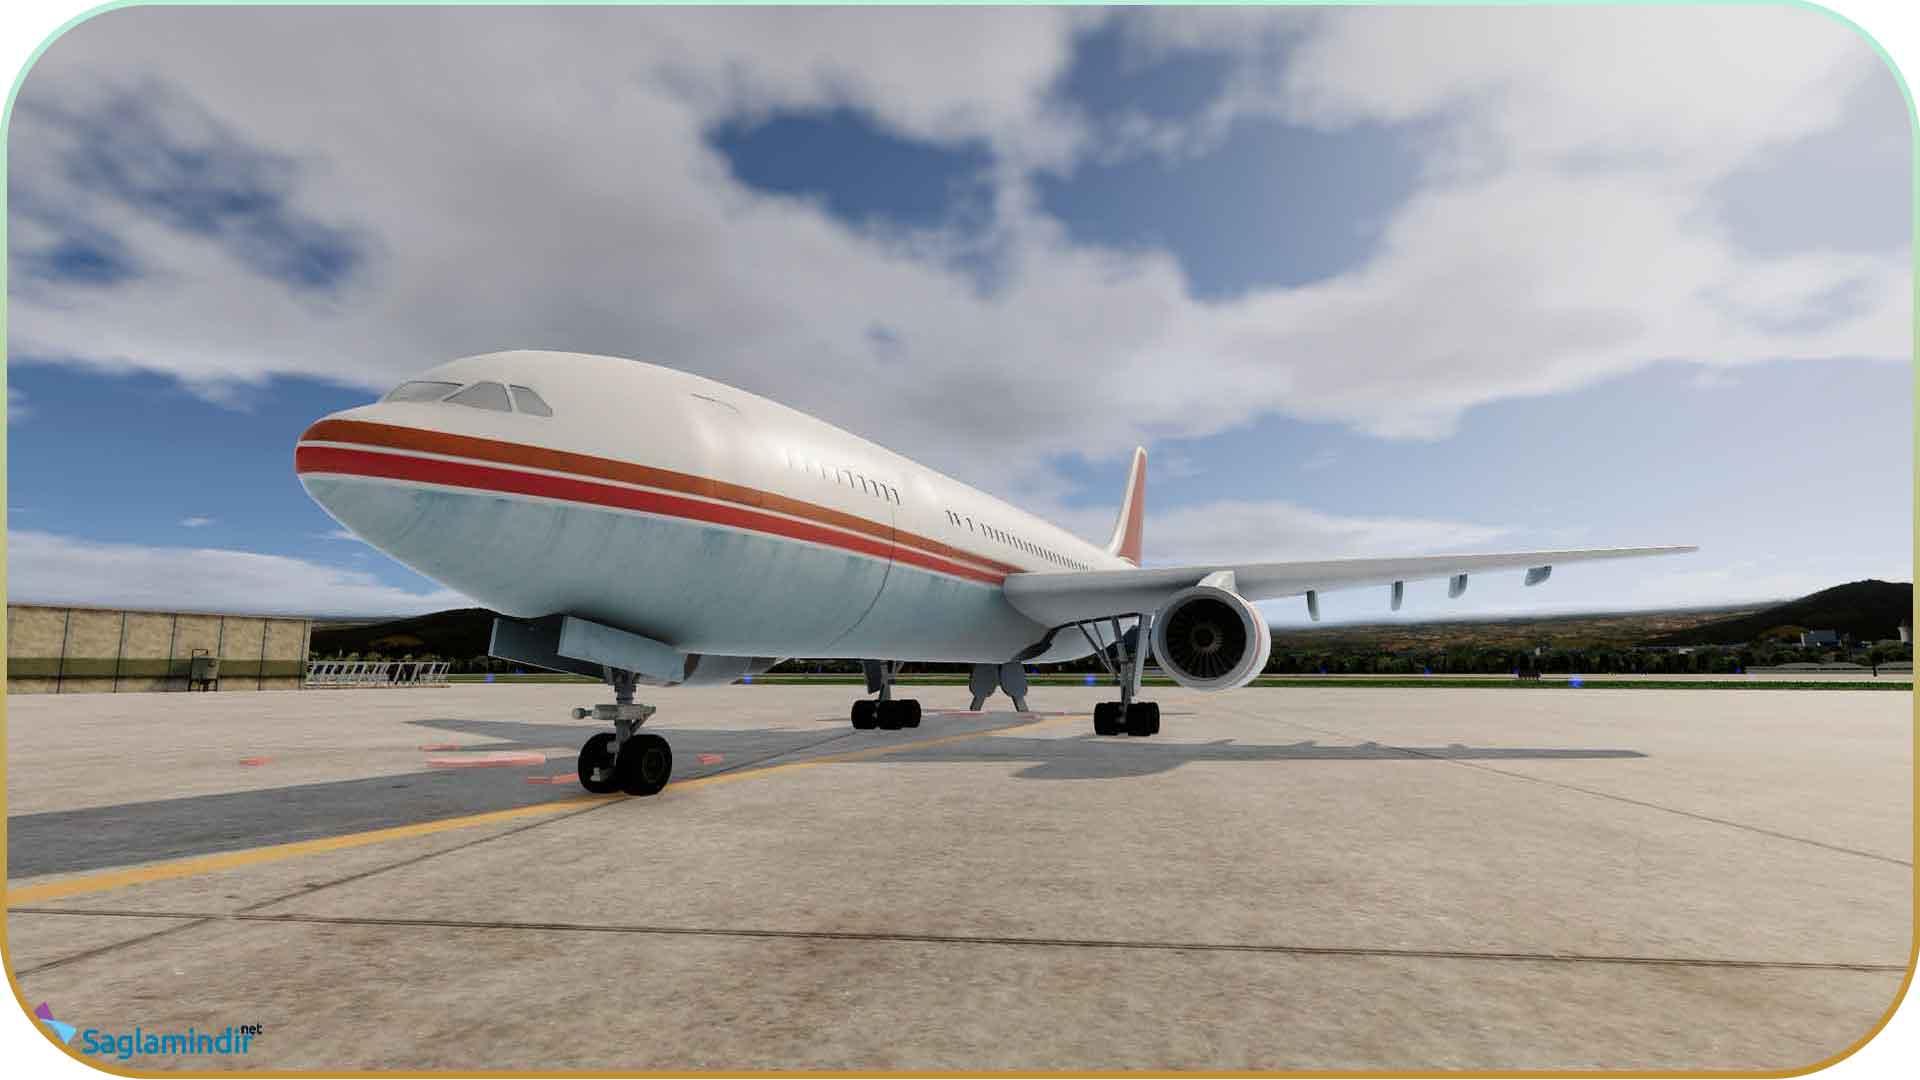 Airport Simulator 2019 saglamindir